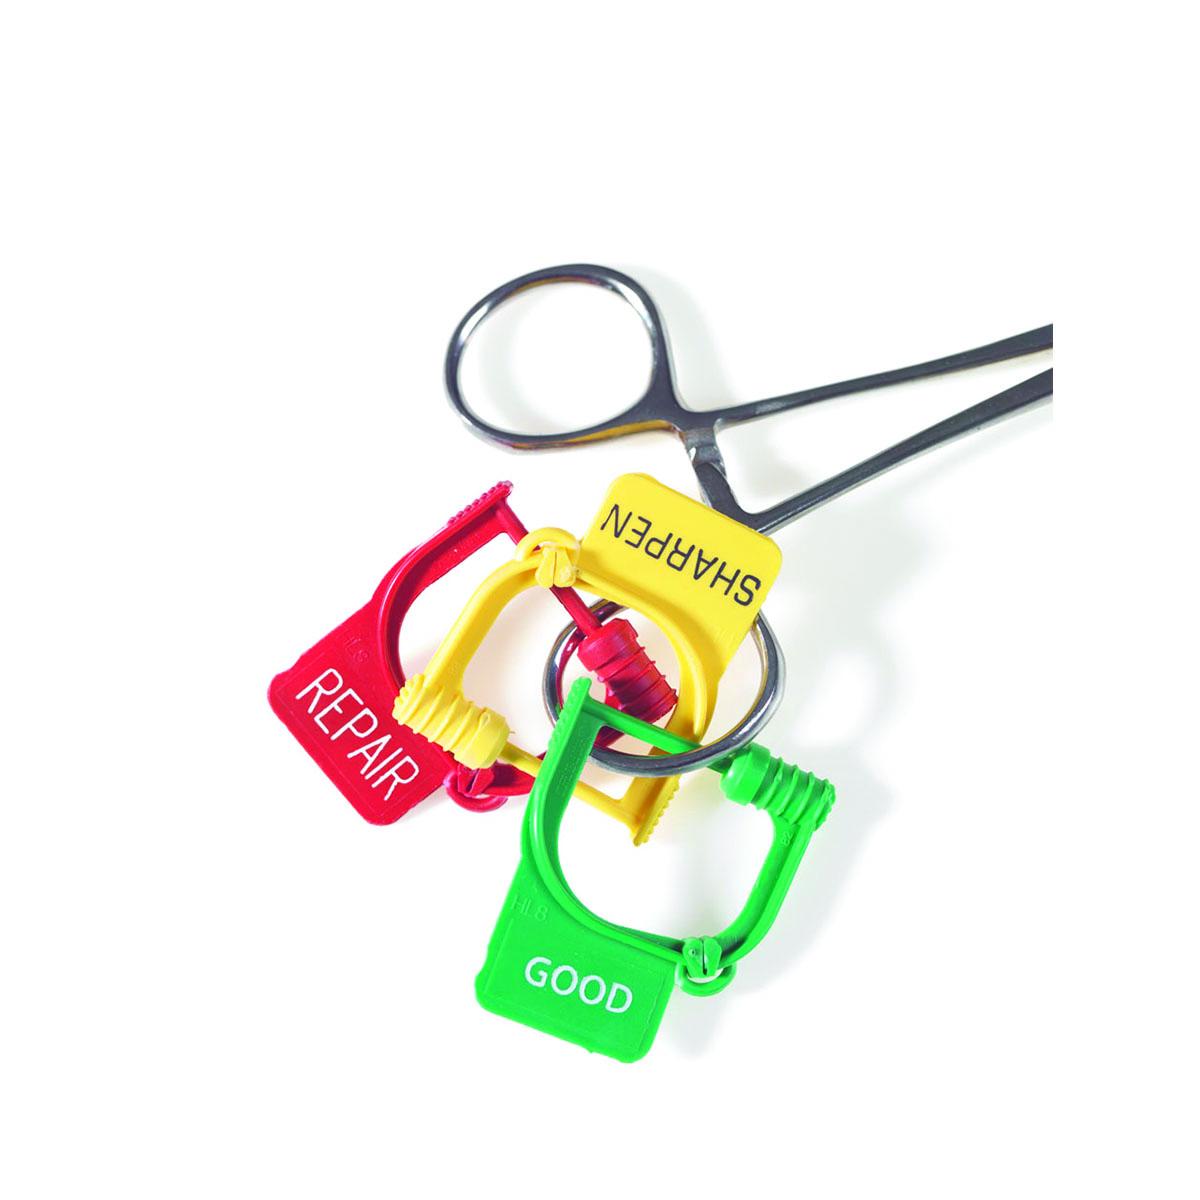 Instrument Locks - 'Good' Image